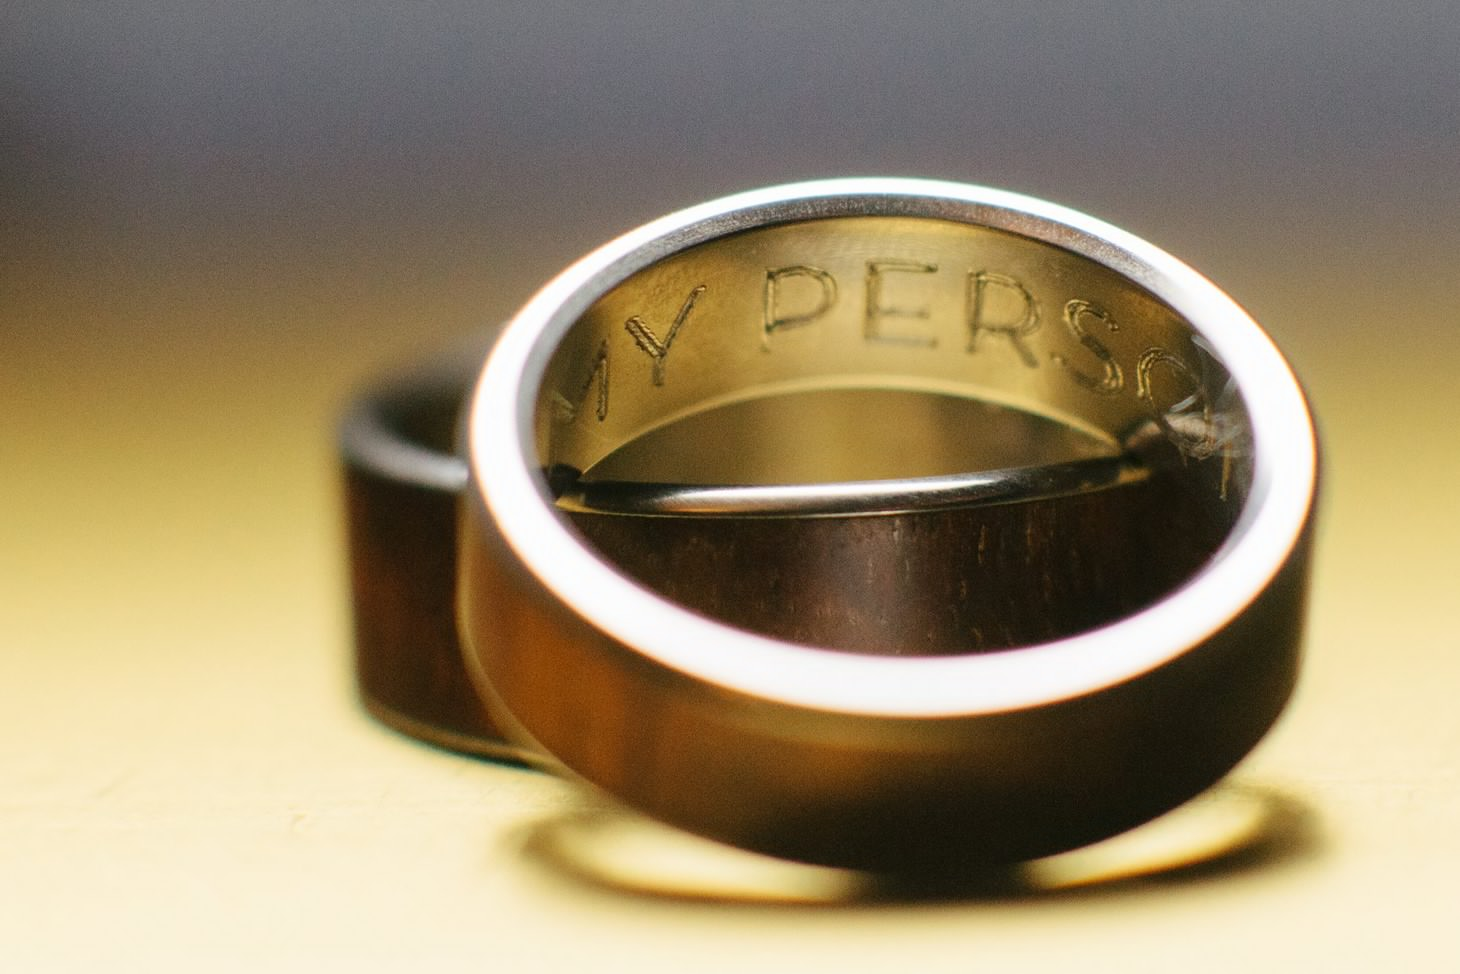 019-nyc-wedding-elopement-lgbt-friendly-photographer-city-hall-kareoke.jpg